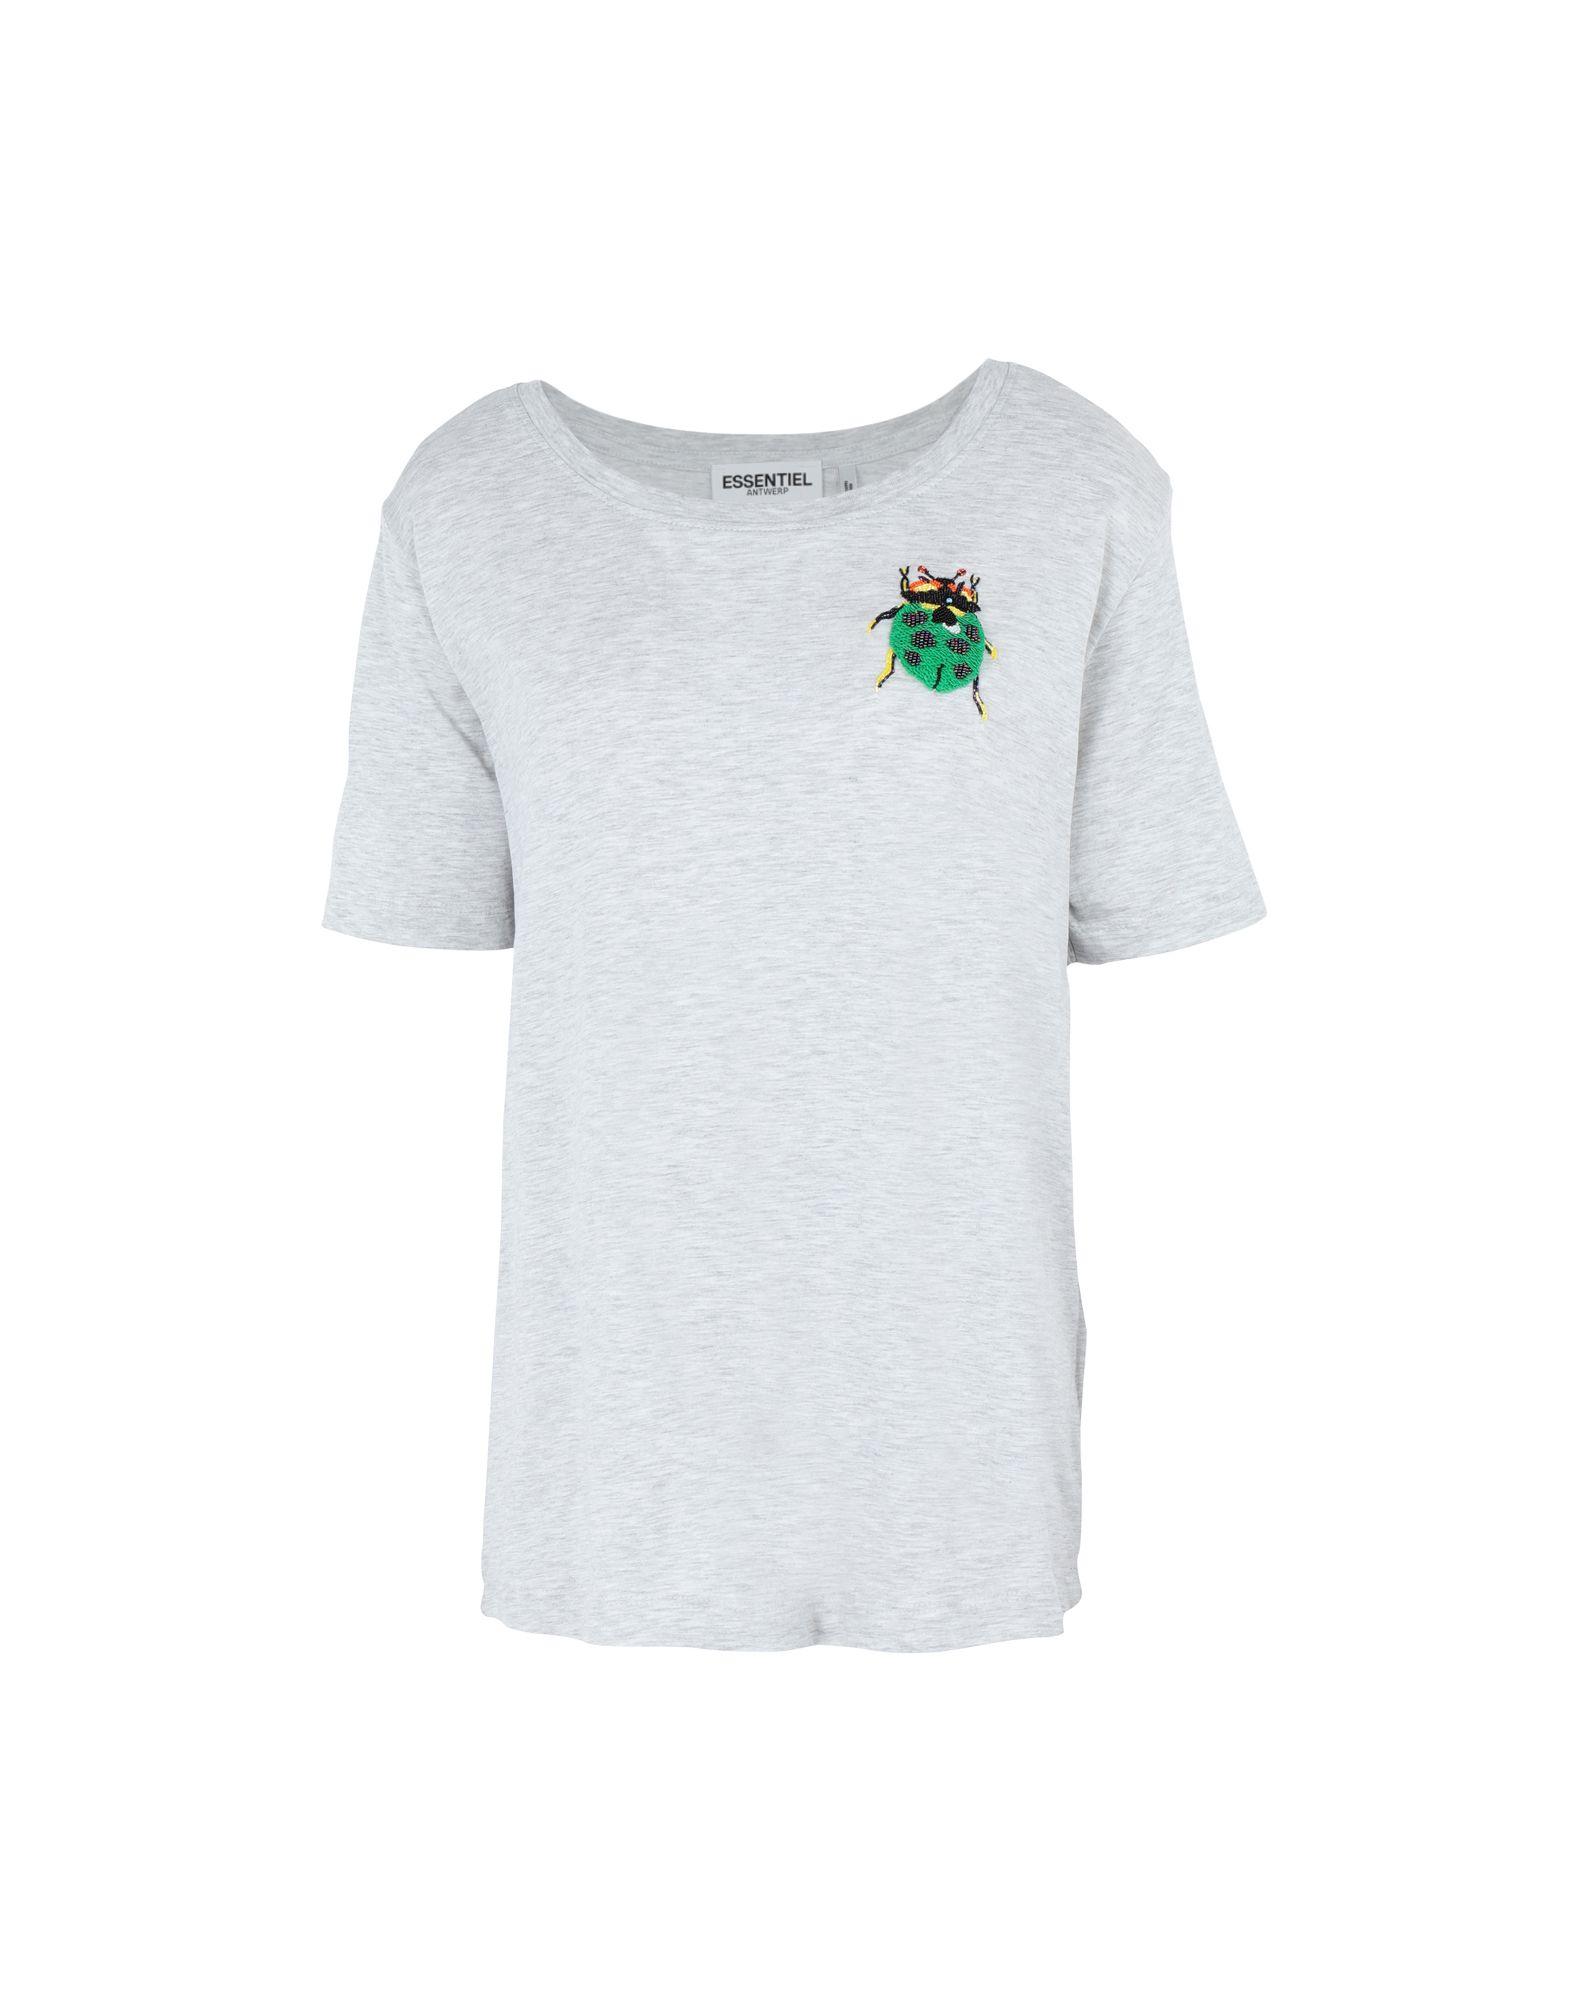 T-Shirt T-Shirt T-Shirt Essentiel Antwerp Sobeetle2 - donna - 12320947RC 007